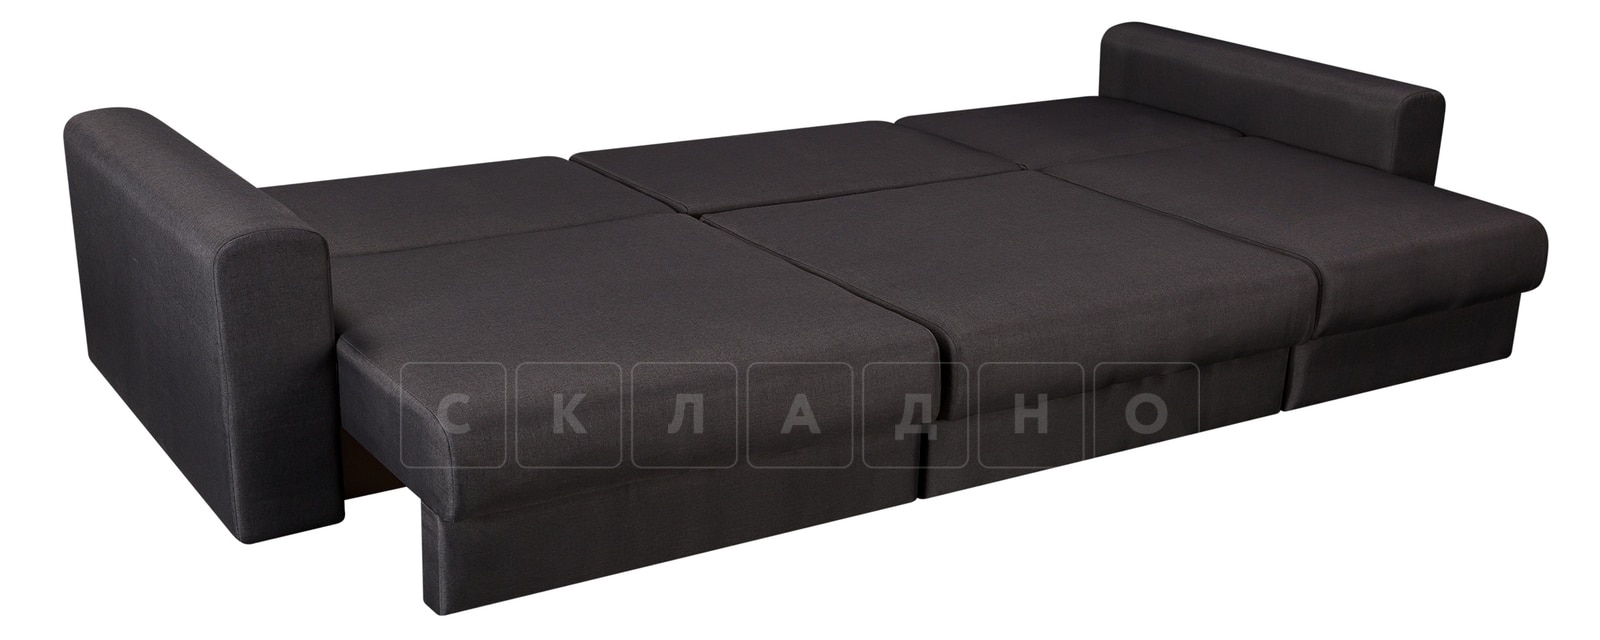 Диван Медисон темно-серый 325 см фото 4 | интернет-магазин Складно